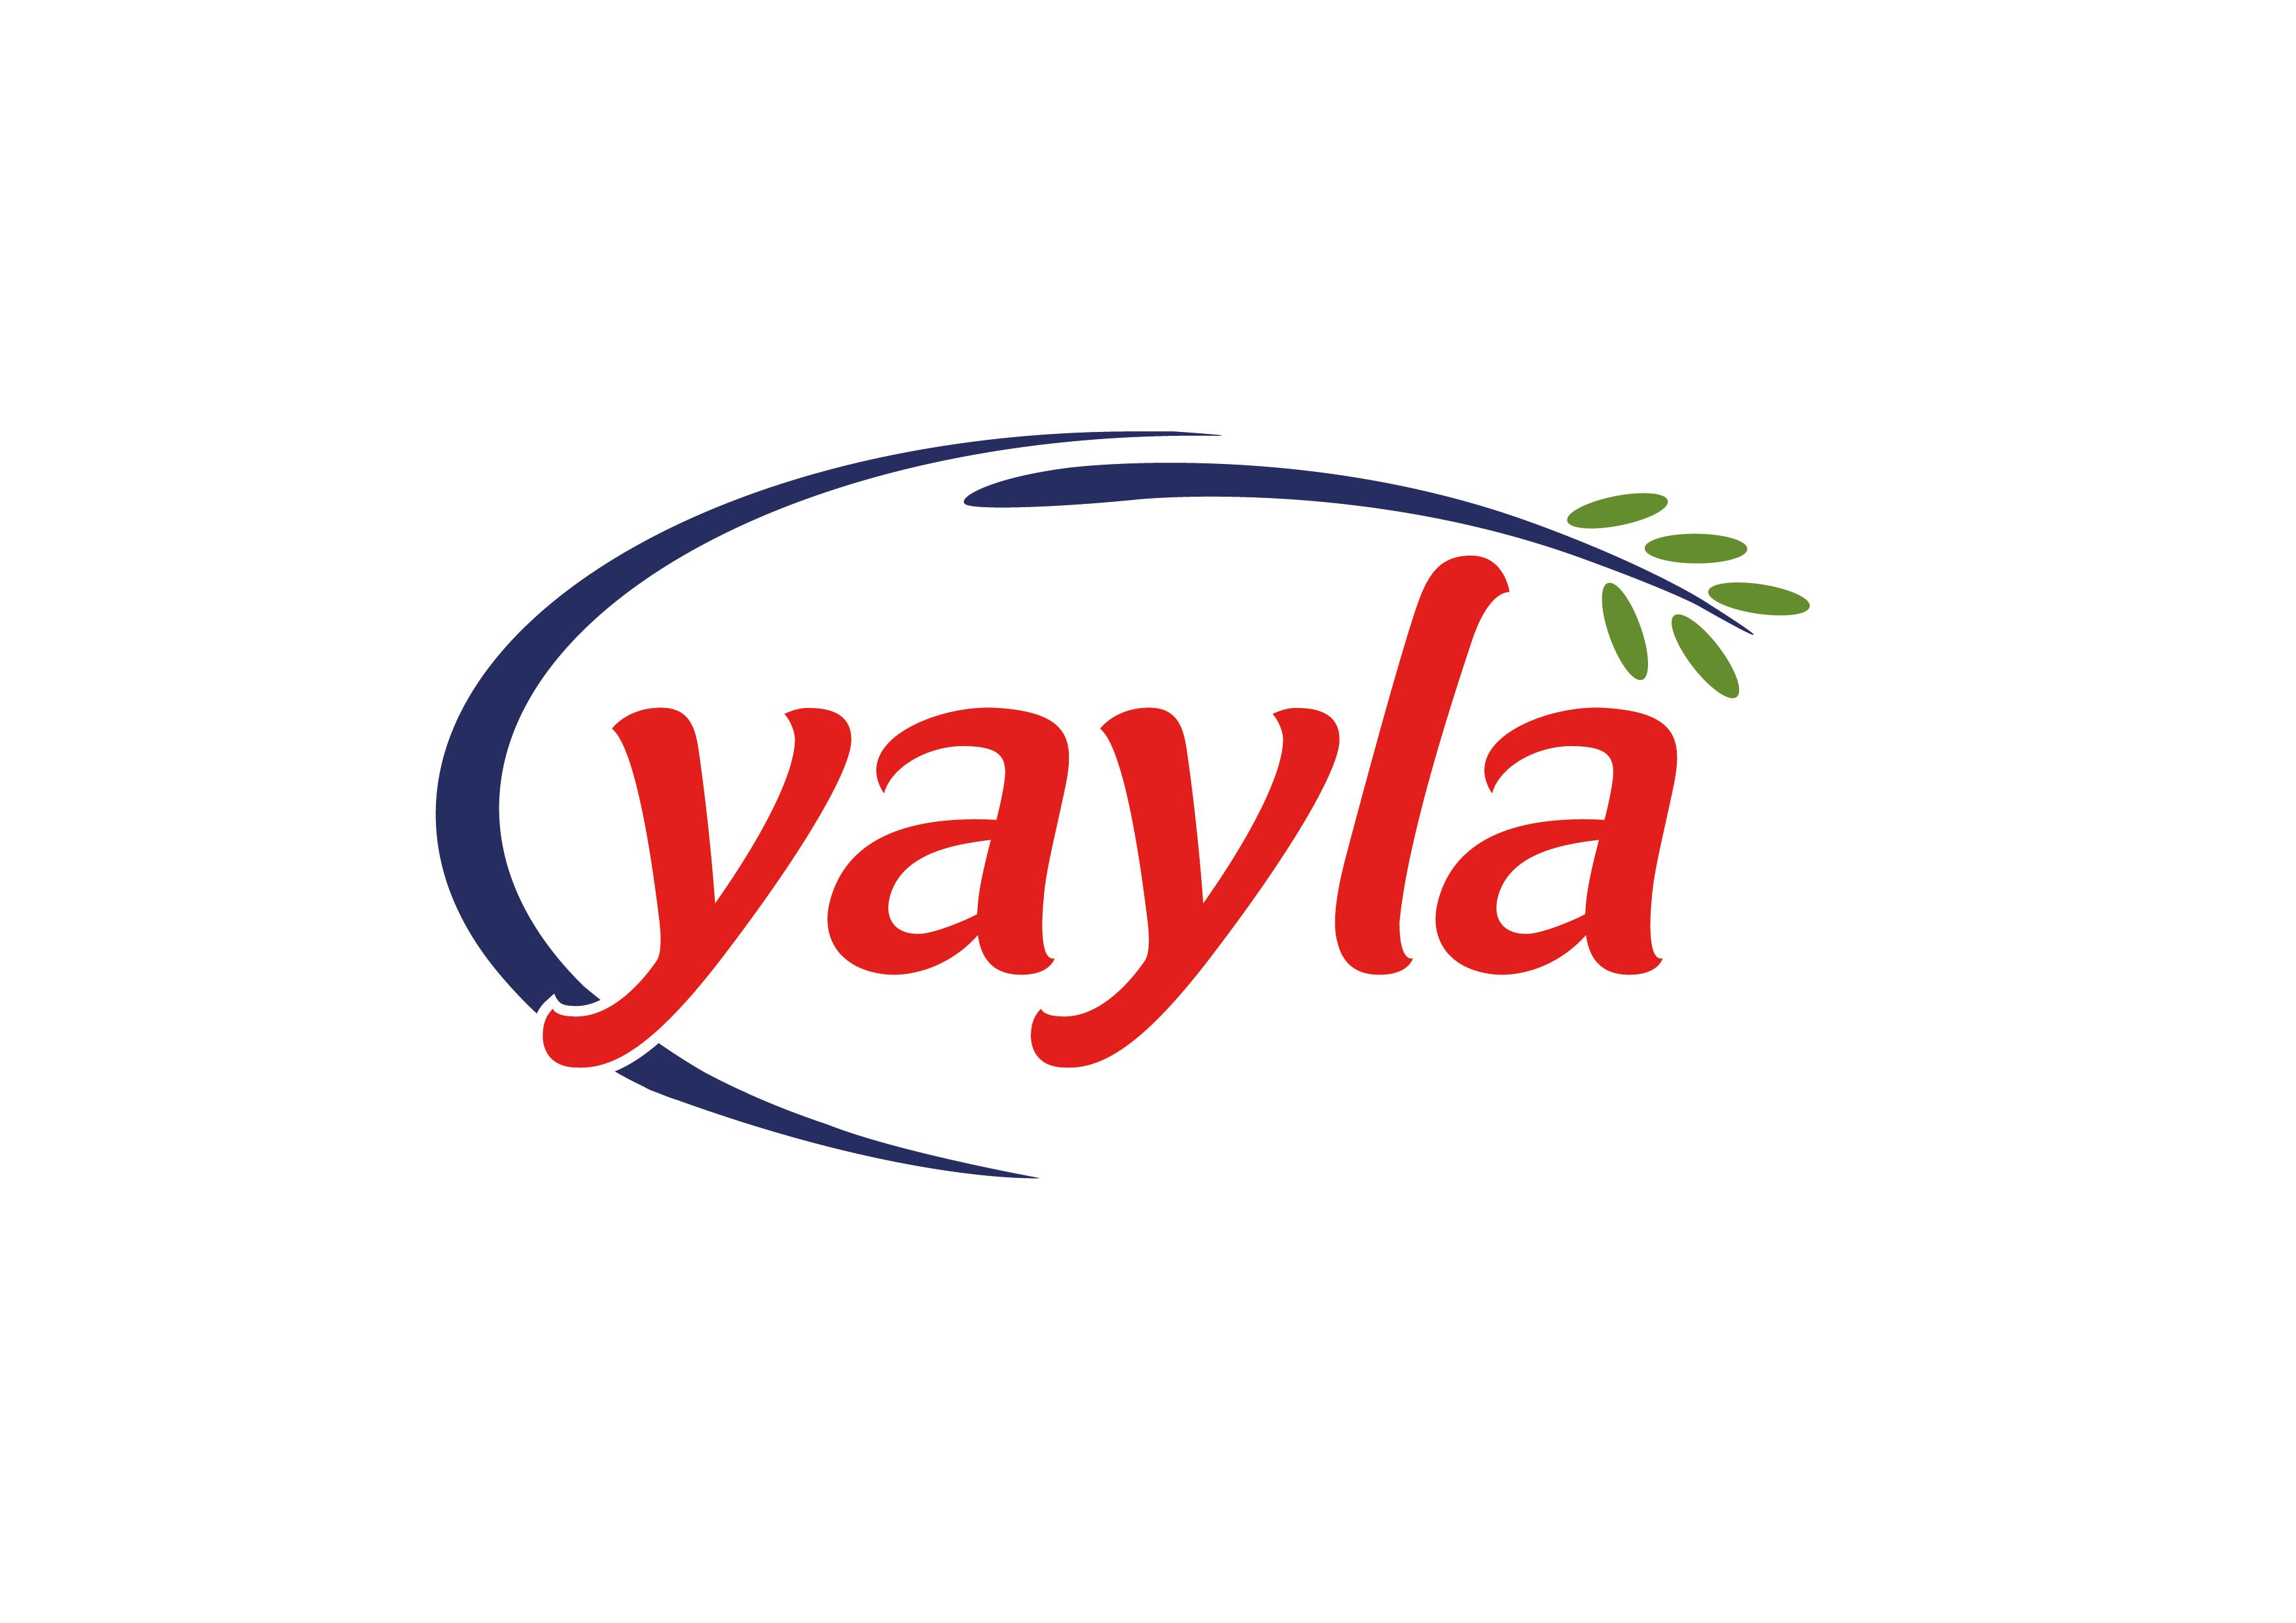 1616568944_yayla_logo_yeni